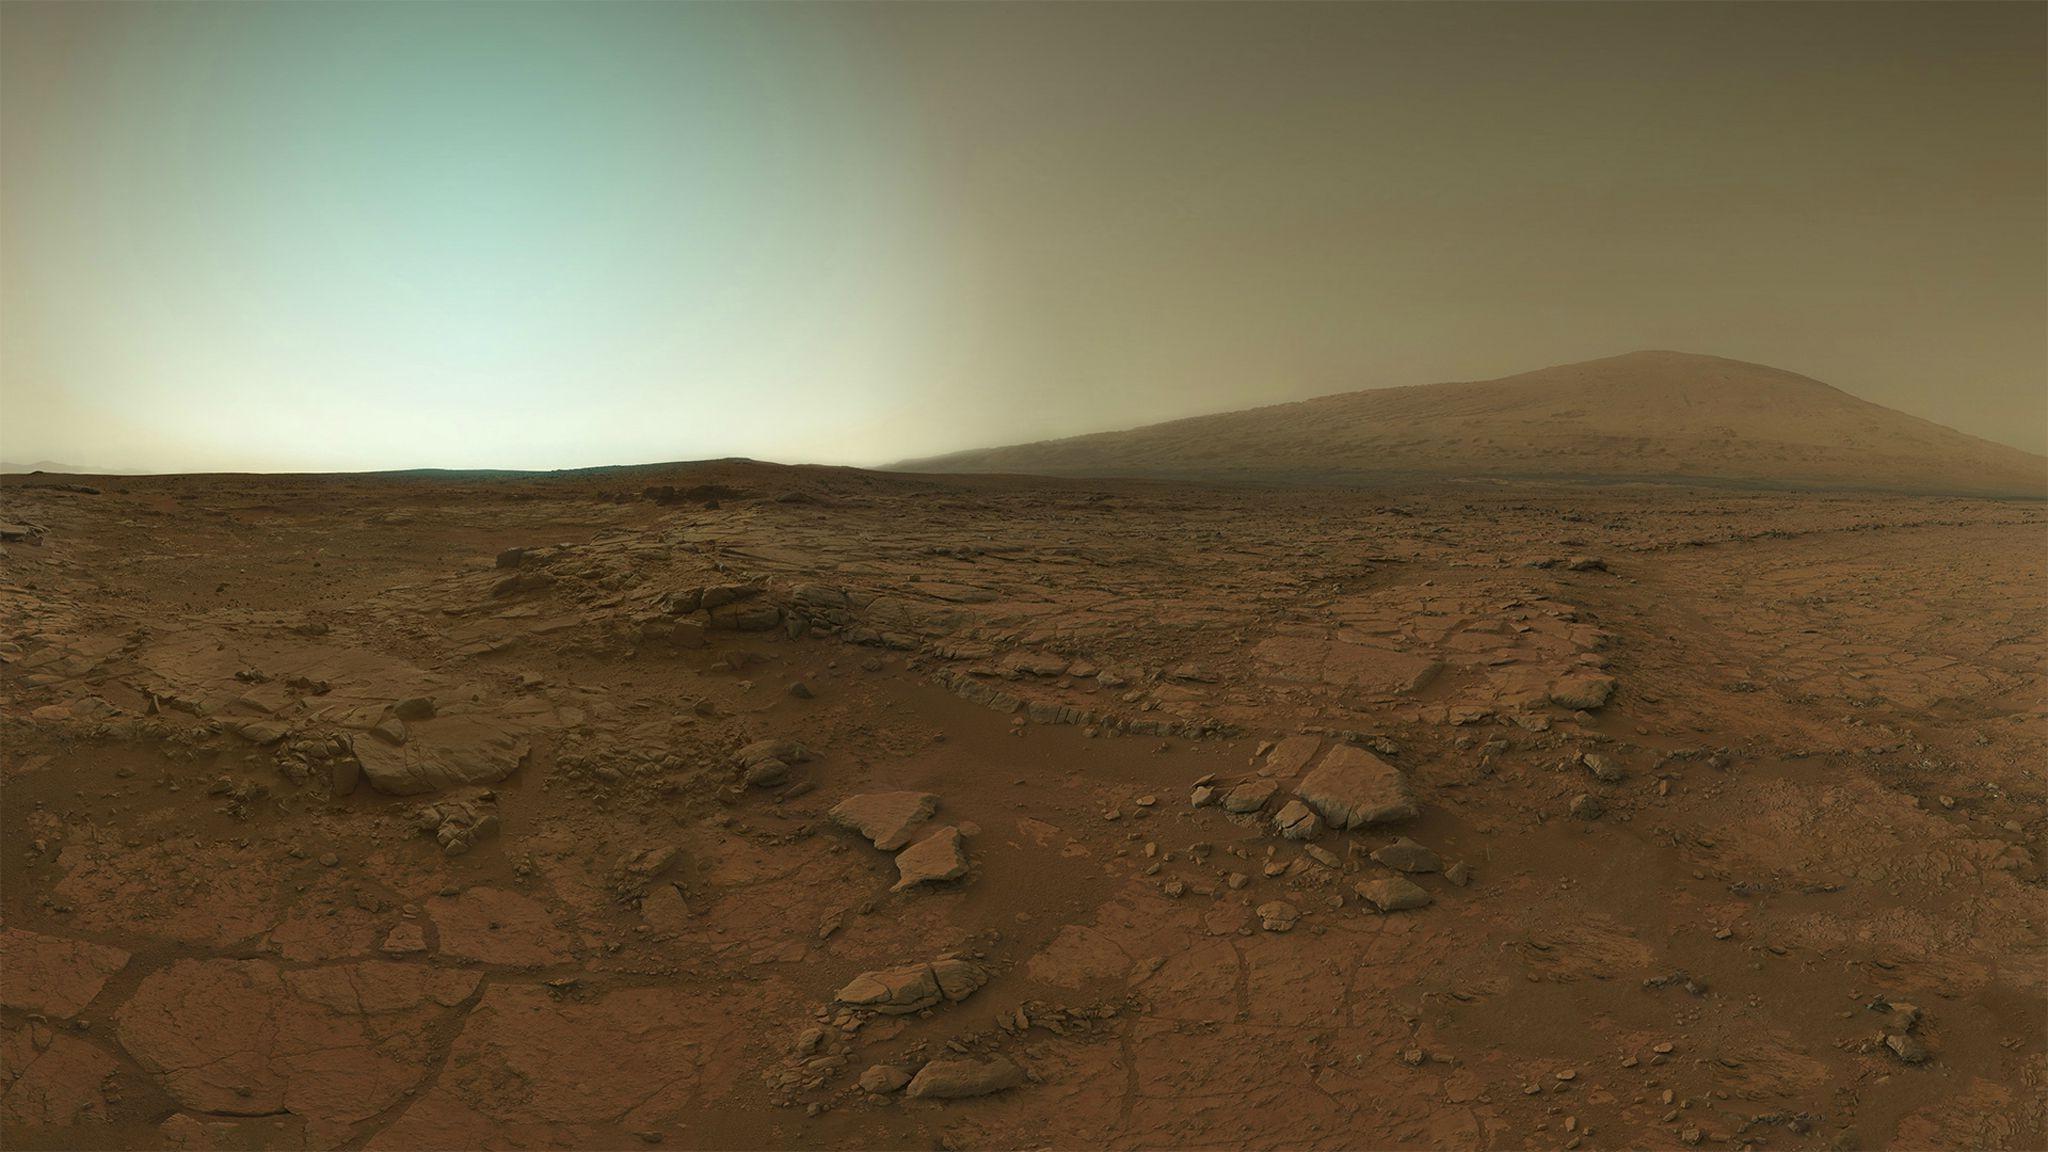 mars landscape images - HD1920×1200